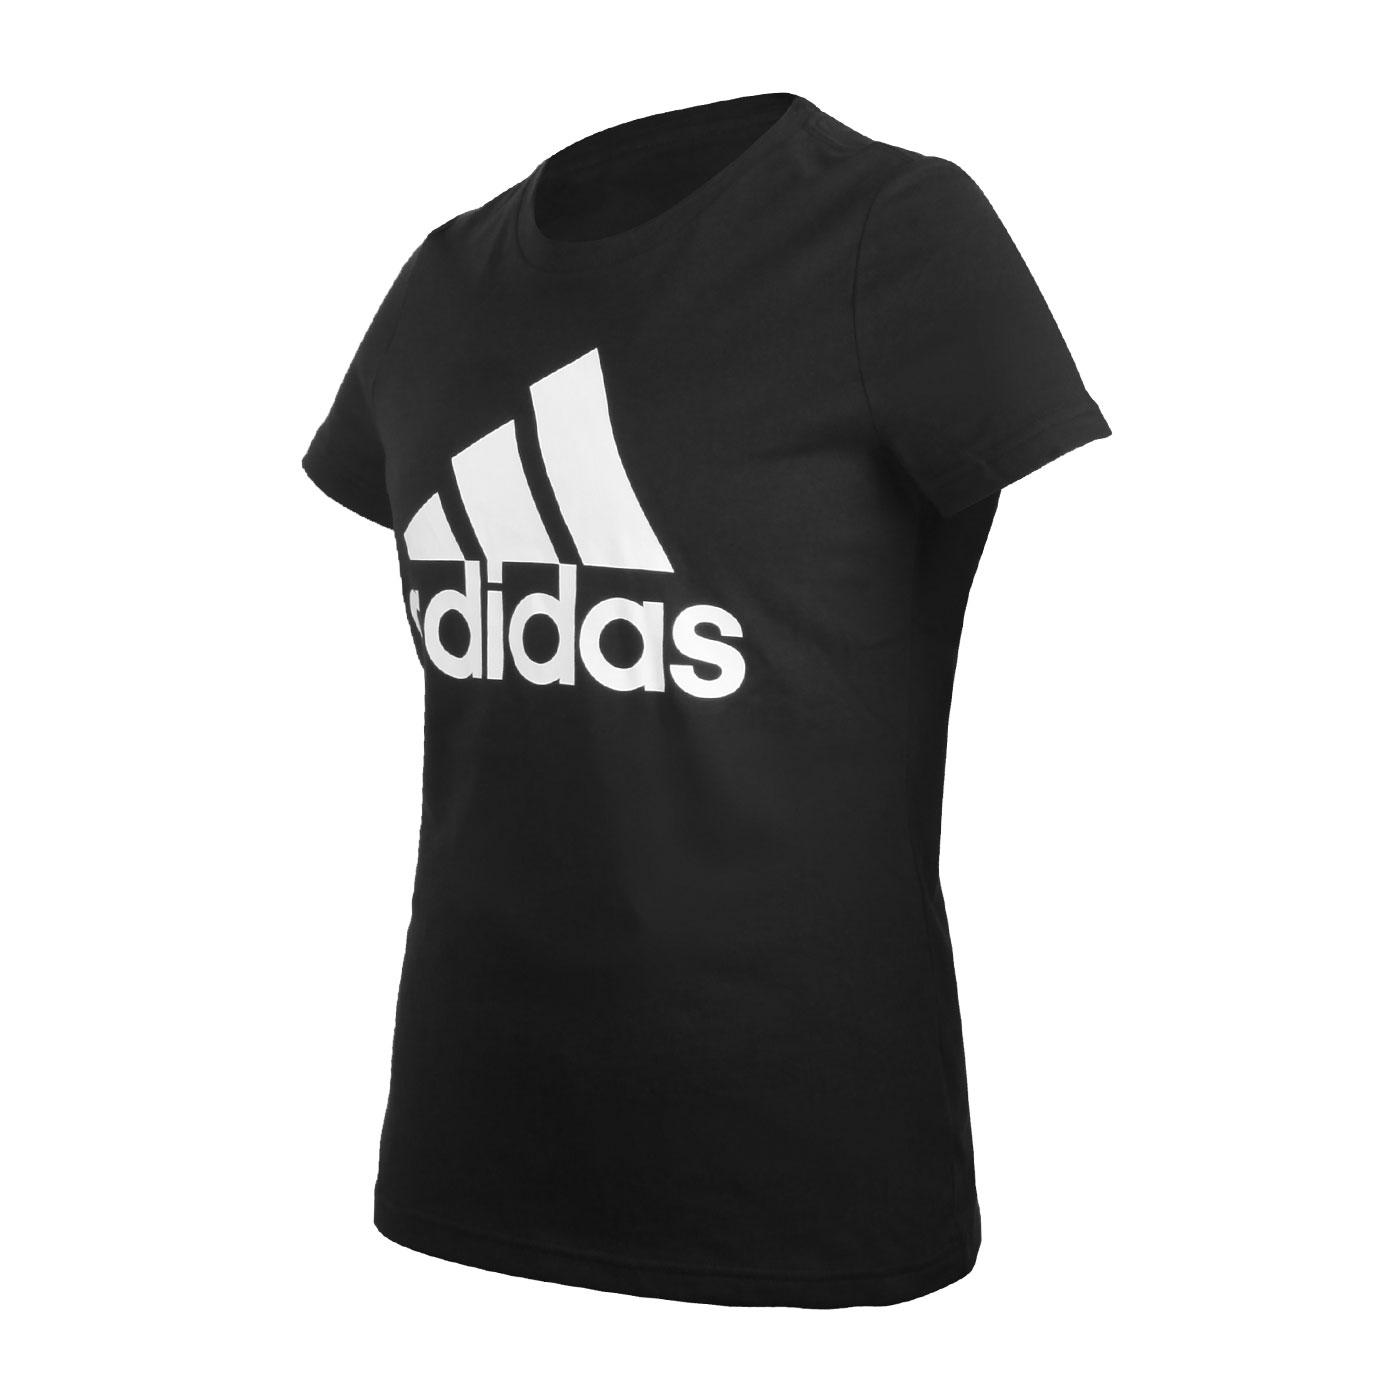 ADIDAS 女款短袖T恤 FQ3237 - 黑白